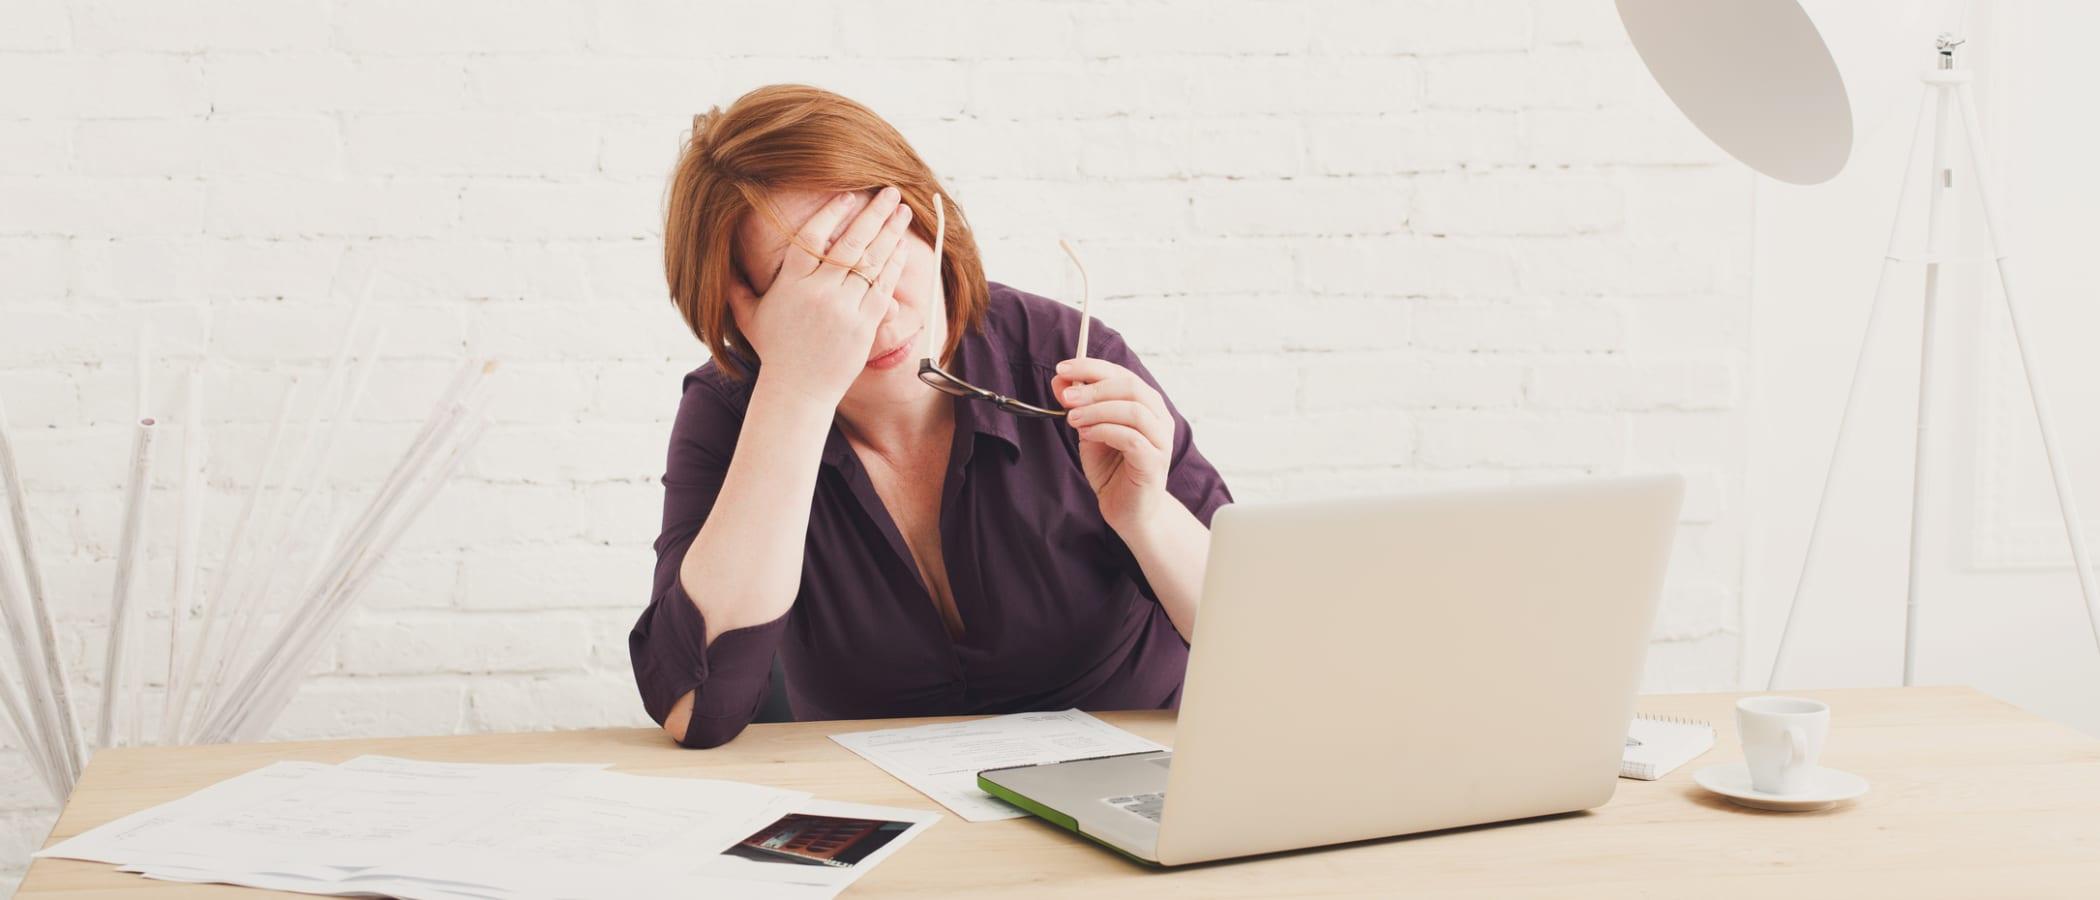 Why Women Disengage at Work